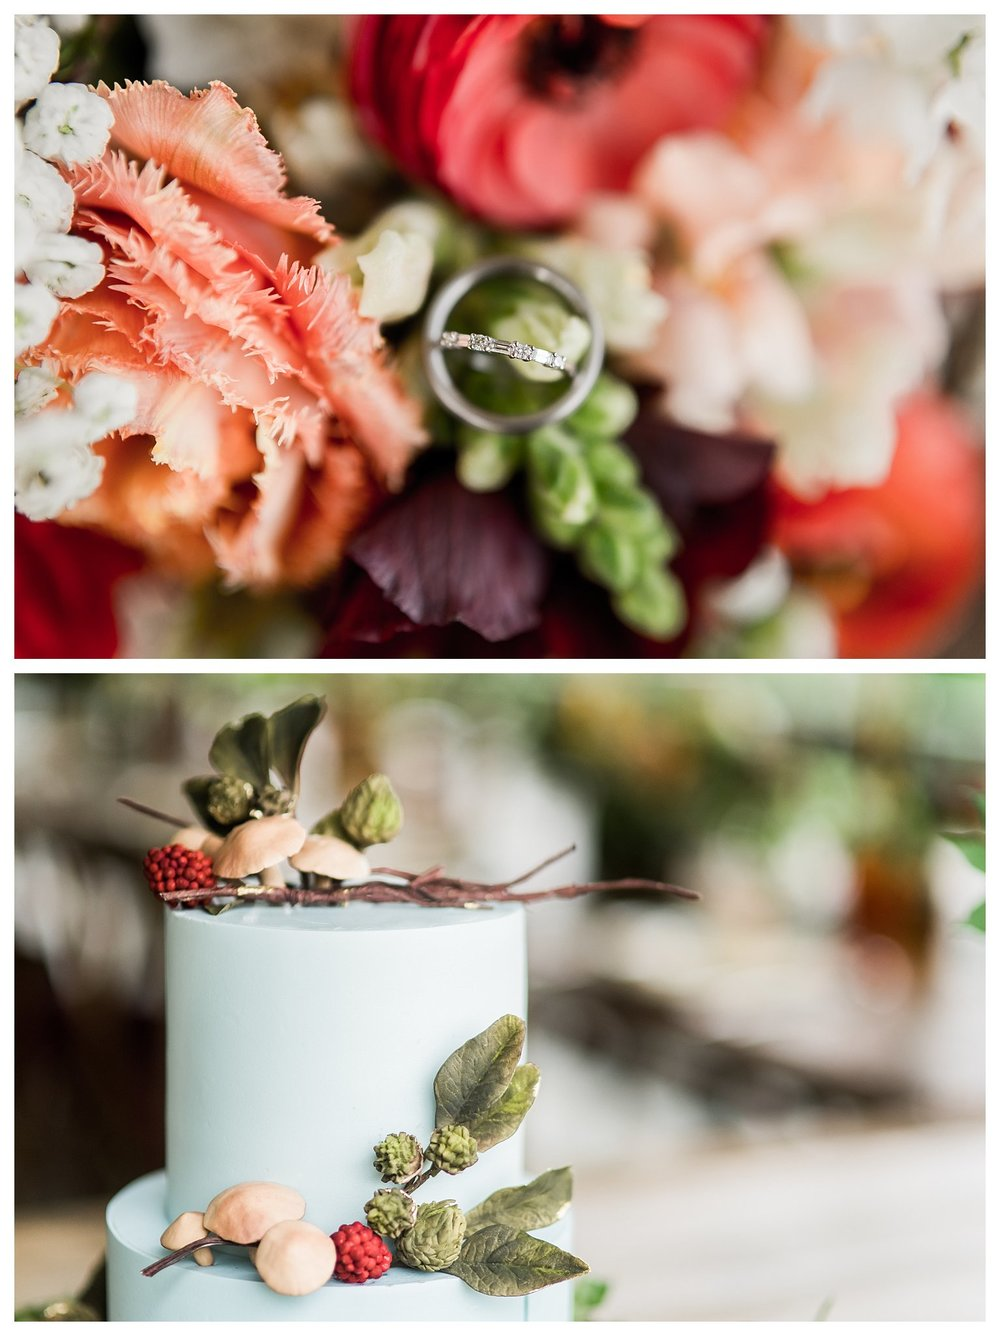 everleigh-photography-northern-kentucky-wedding-photographer-rustic-cabin-wedding-cincinnati-wedding-photographer-wedding-photo-inspiration-wedding-decor-inspiration-13